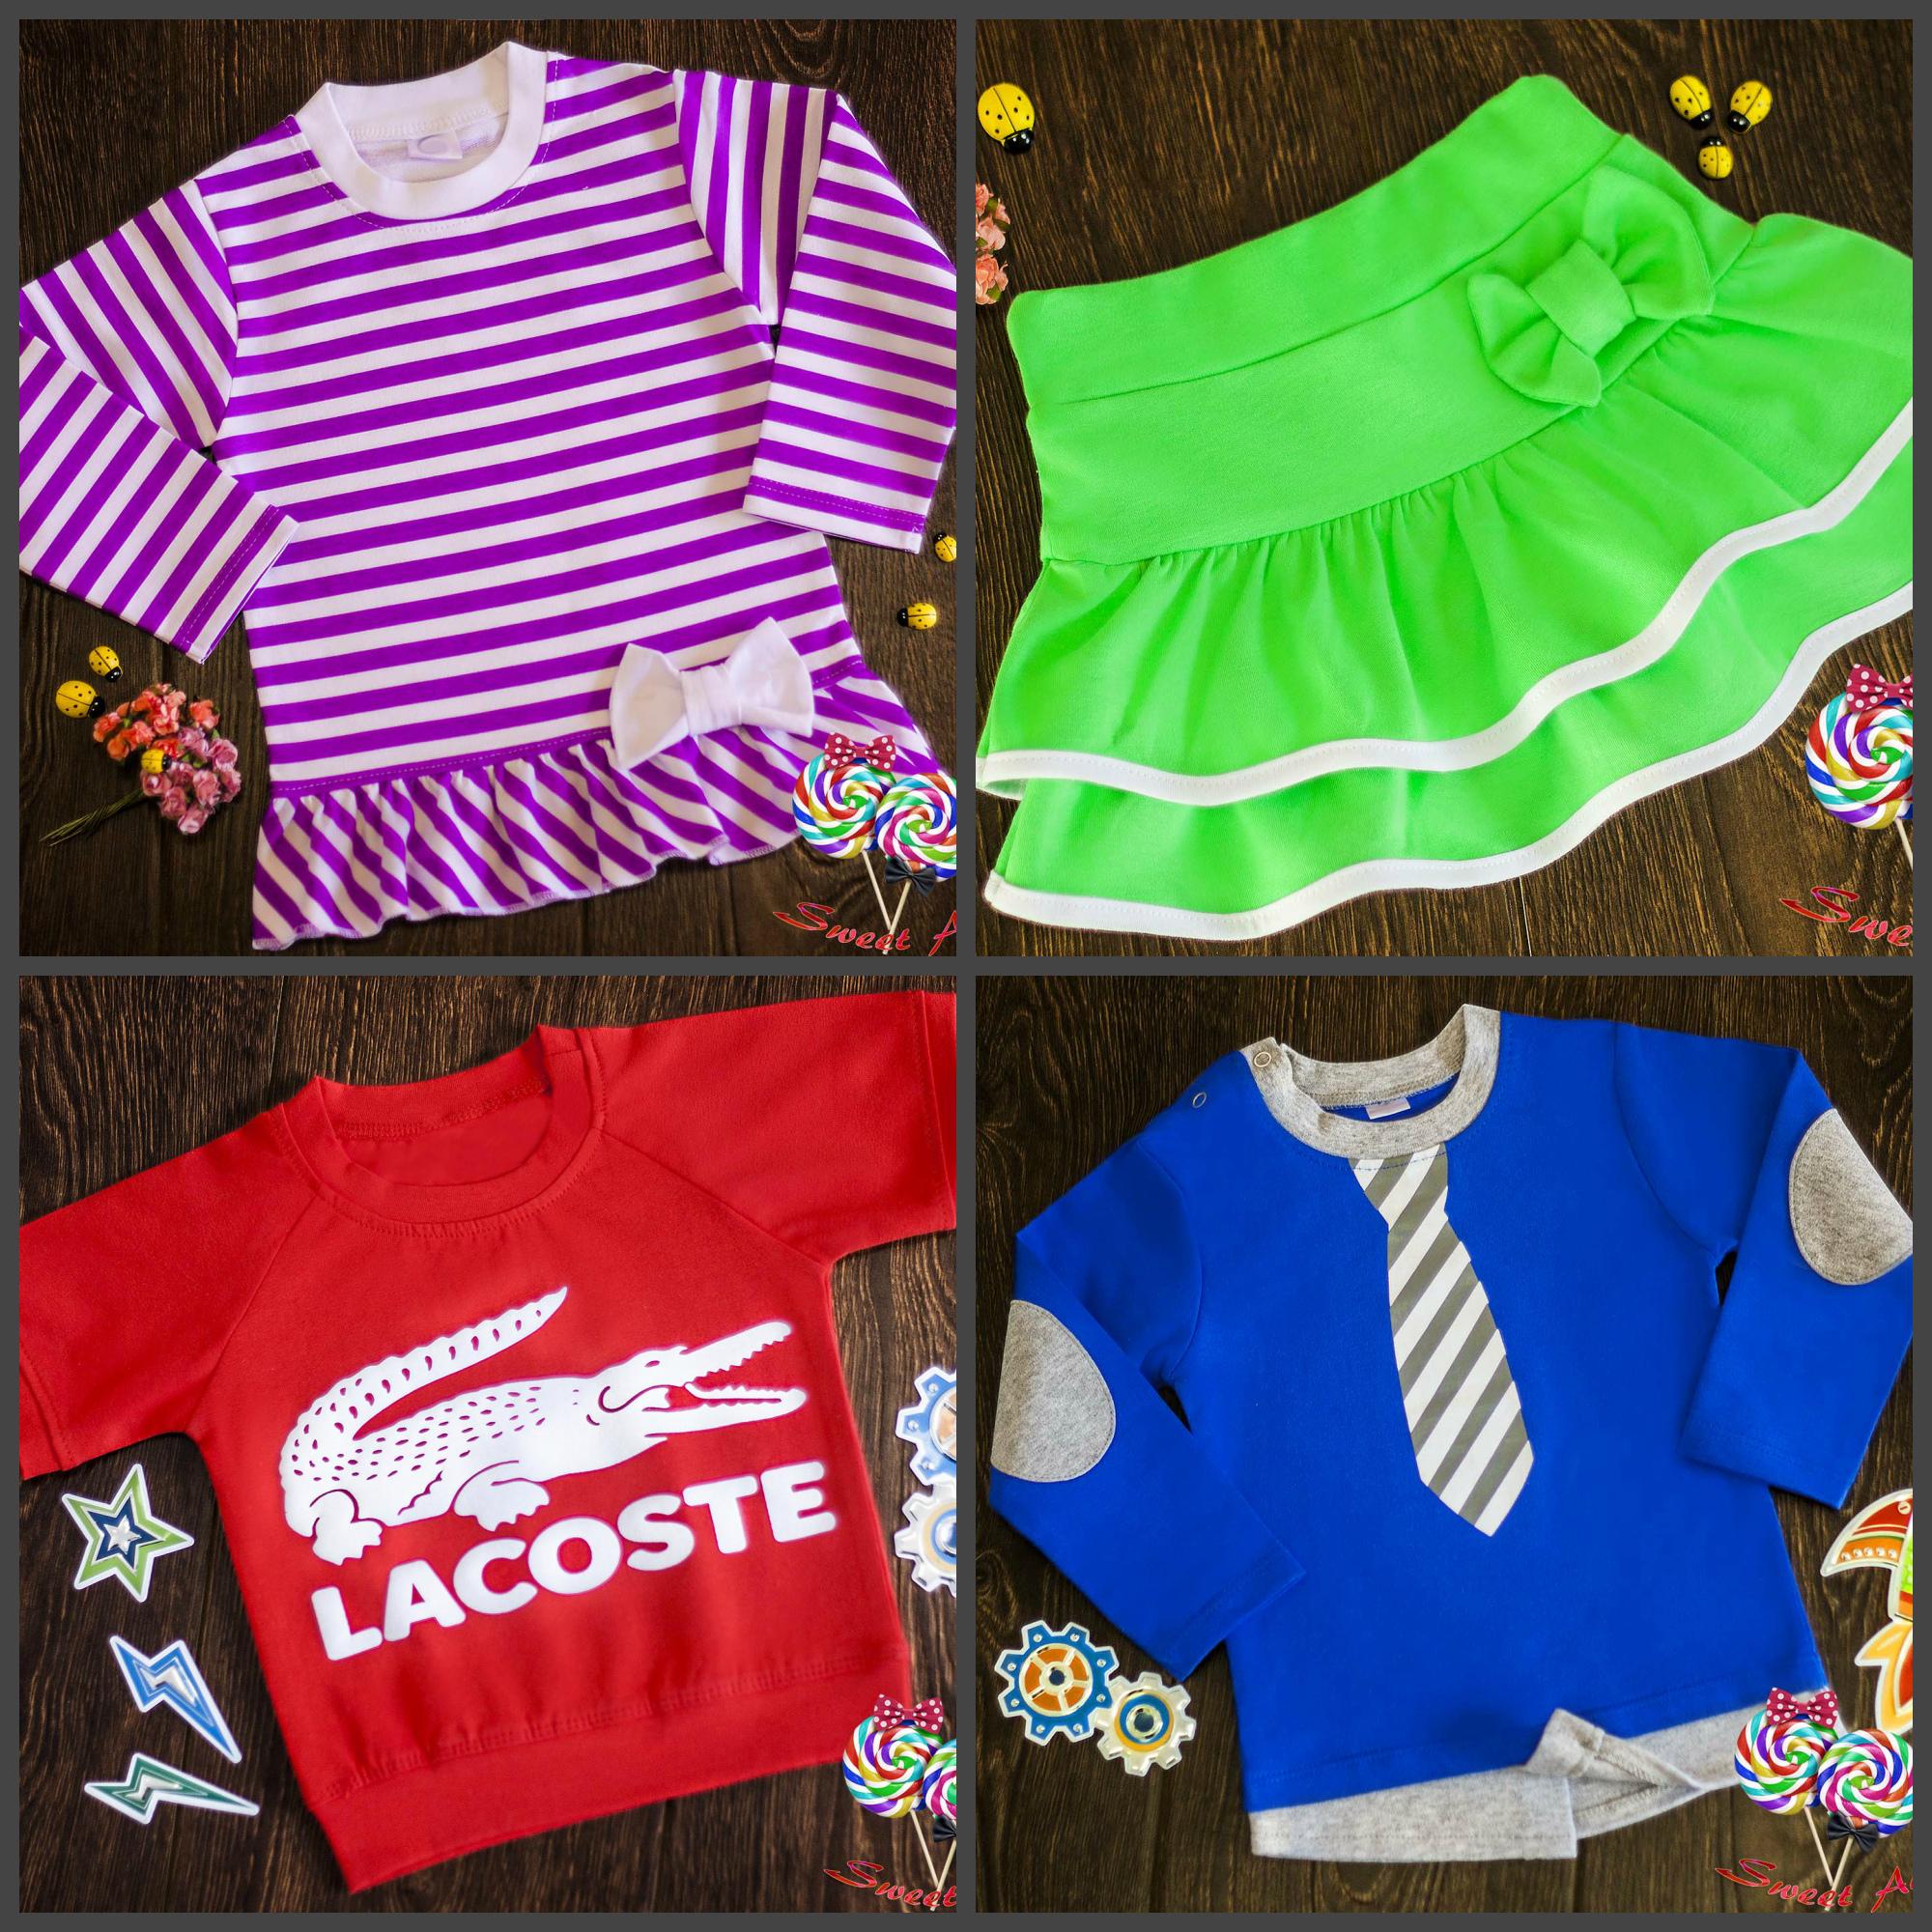 Новинки! Sweet age - яркая одежда для детей (от 56 до 122 см)